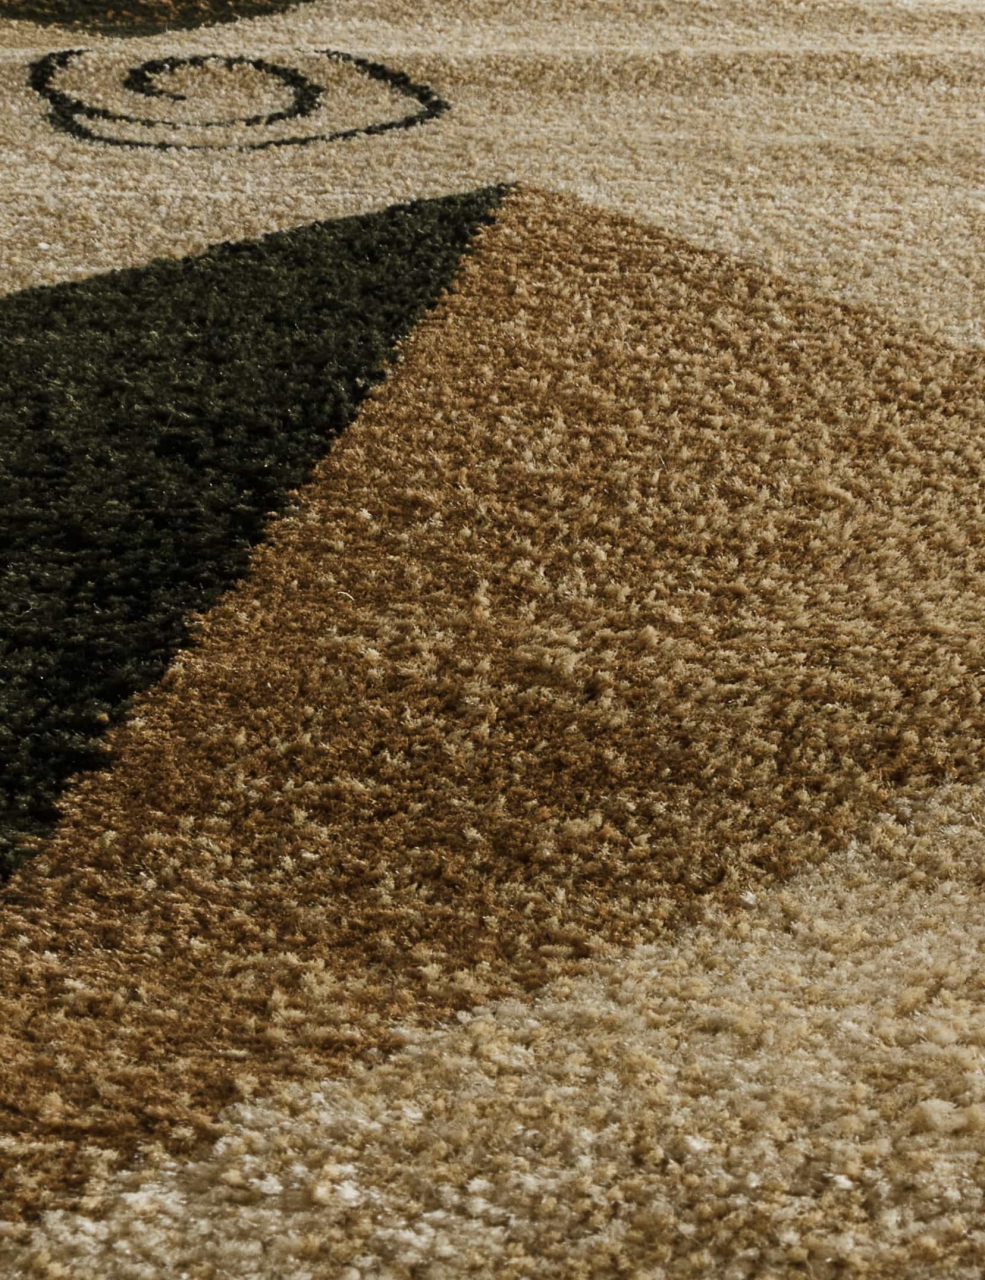 Ковер 5383 - CREAM - Овал - коллекция VALENCIA - фото 3